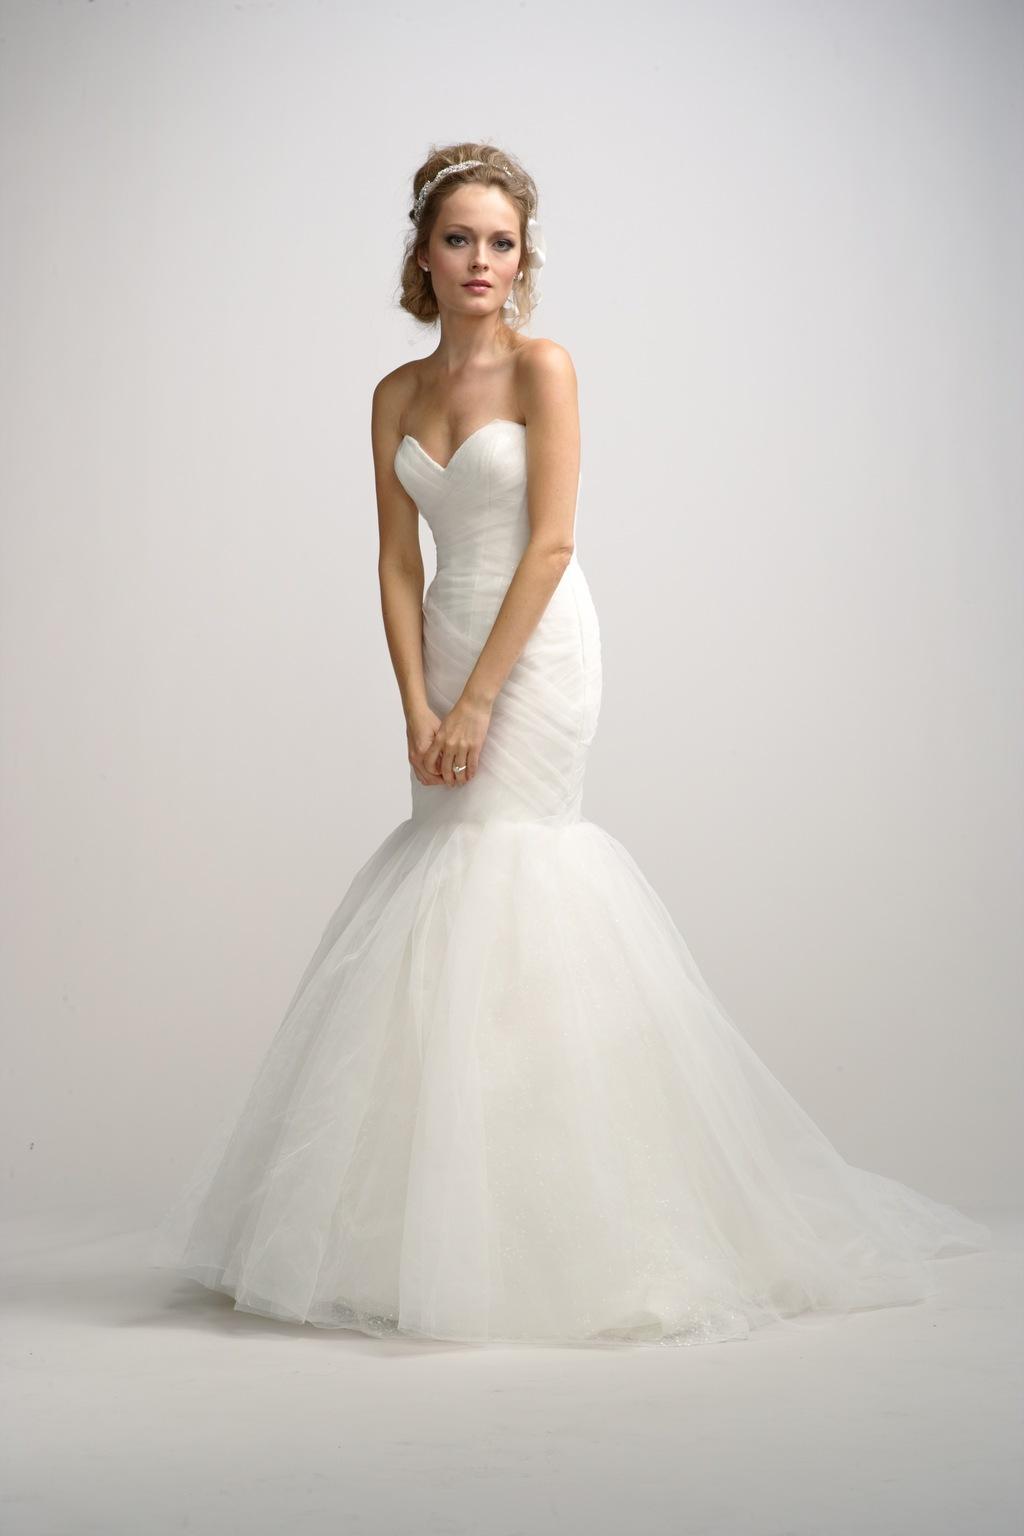 Fall-2012-wedding-dress-watters-bridal-gown-18.original.full